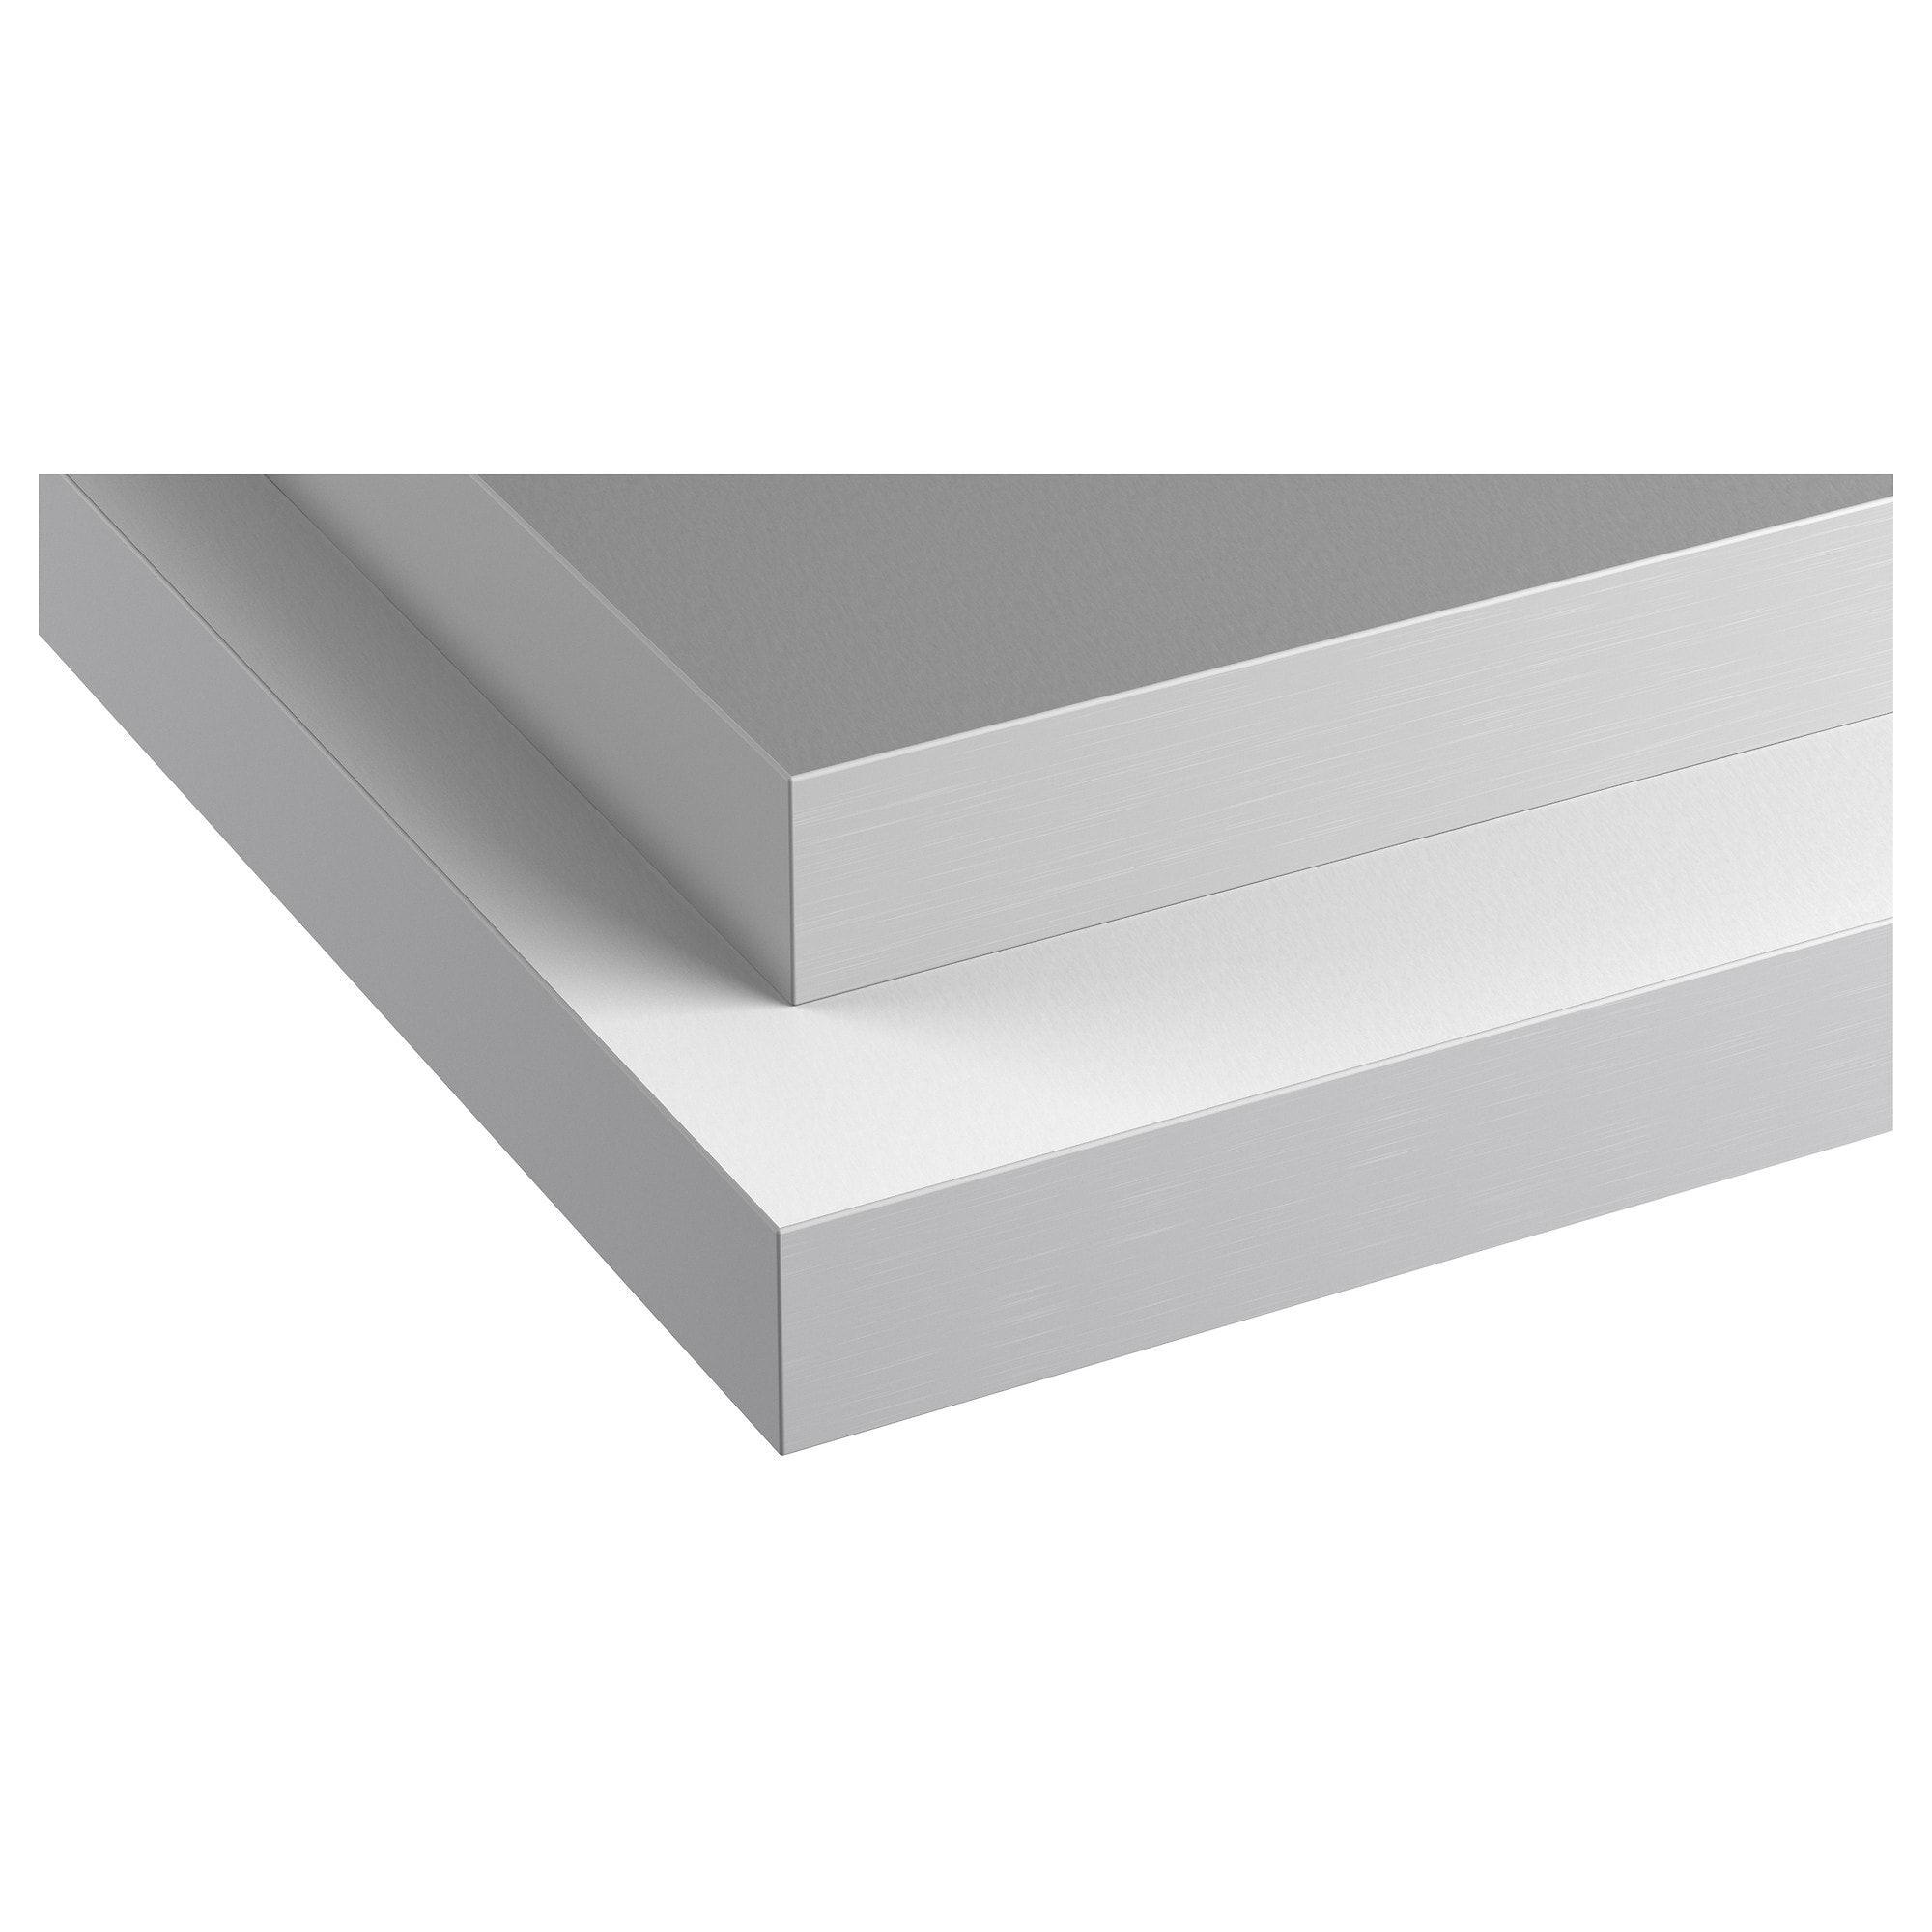 Hallestad Arbeitsplatte Doppels Weiss Aluminiumfarben